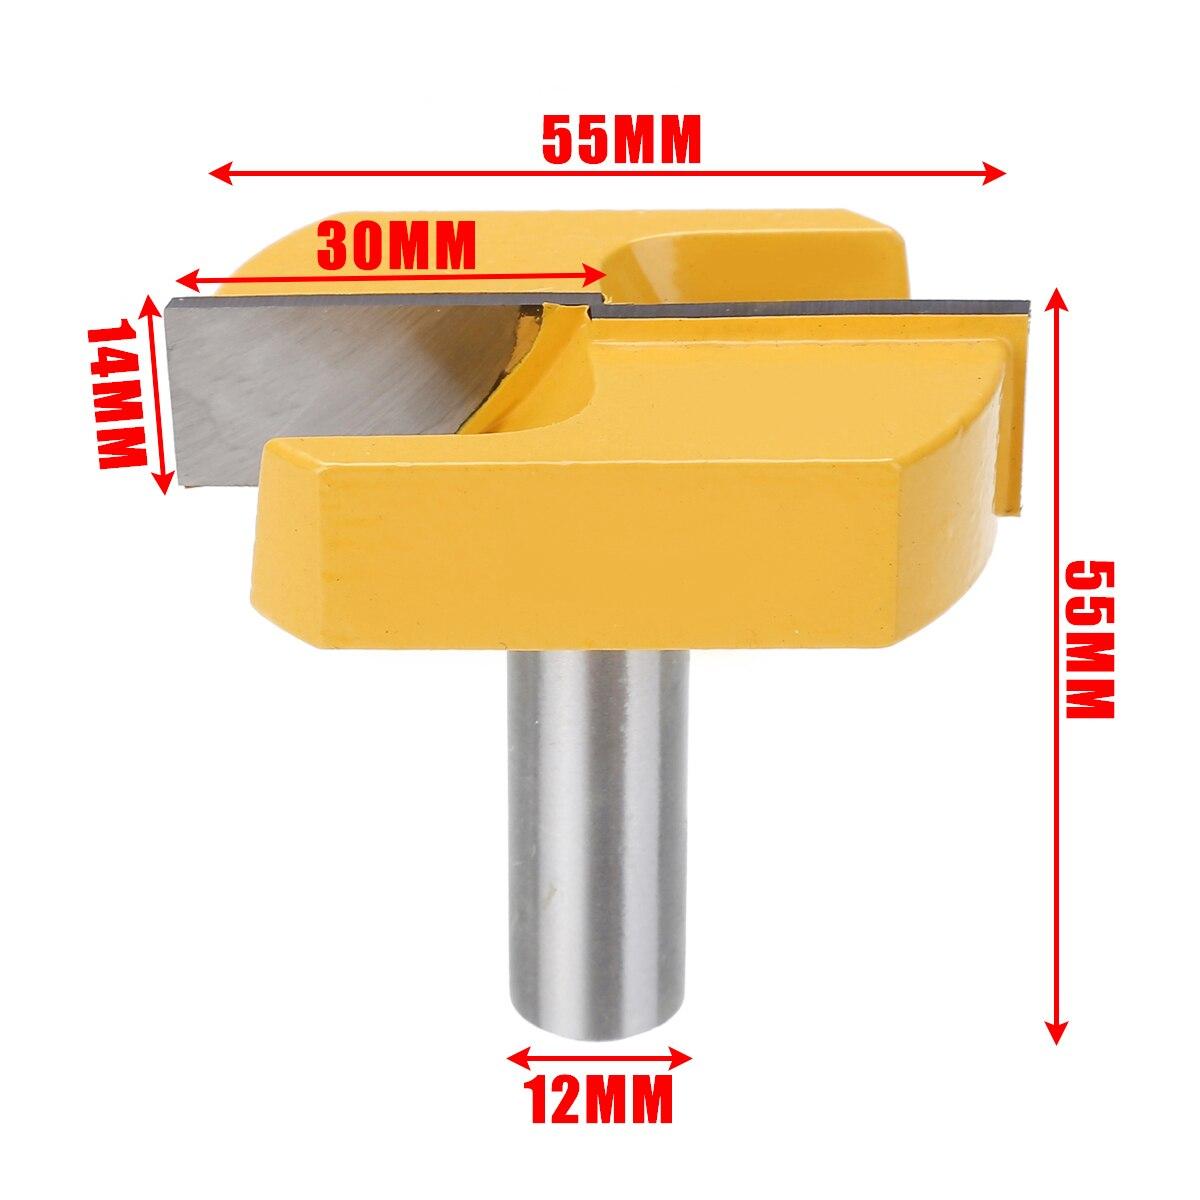 Filetage stylet avec ISK ringschneide 5//16-18 unc x 1 Noir set screw Cup point